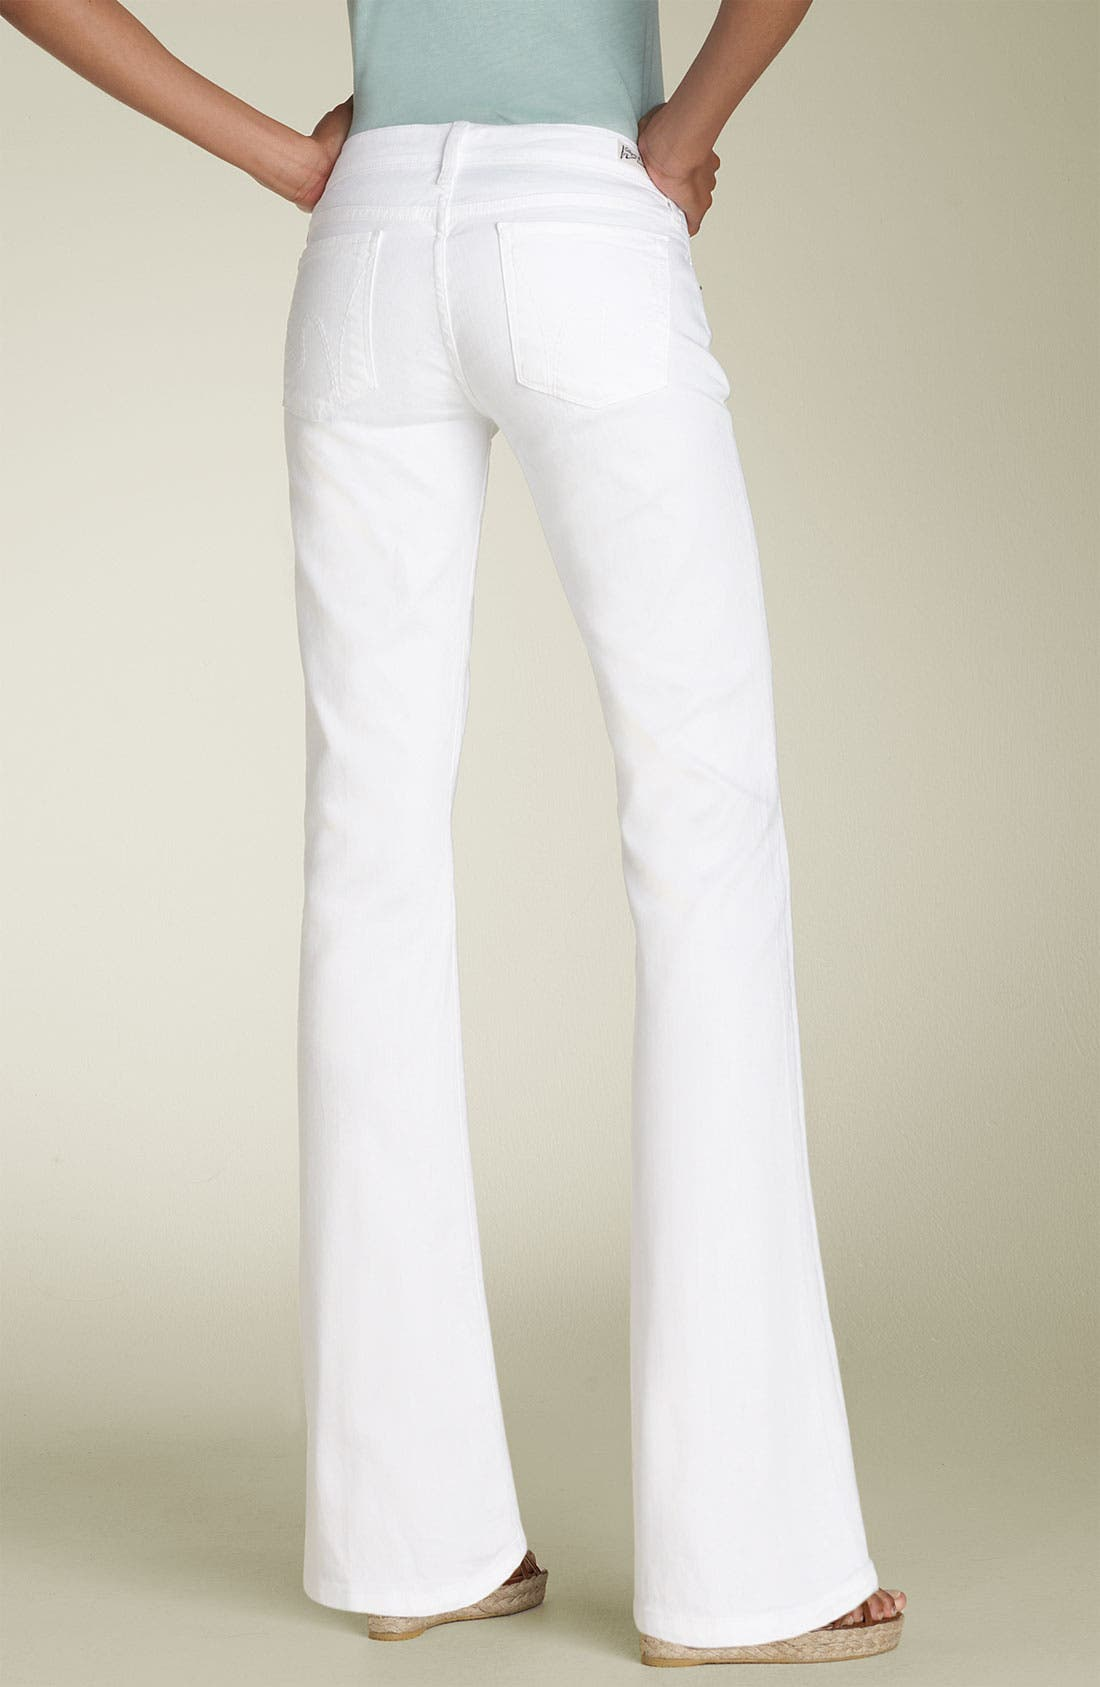 Alternate Image 2  - Citizens of Humanity 'Dita' Bootcut Stretch Jeans (Santorini White) (Petite)